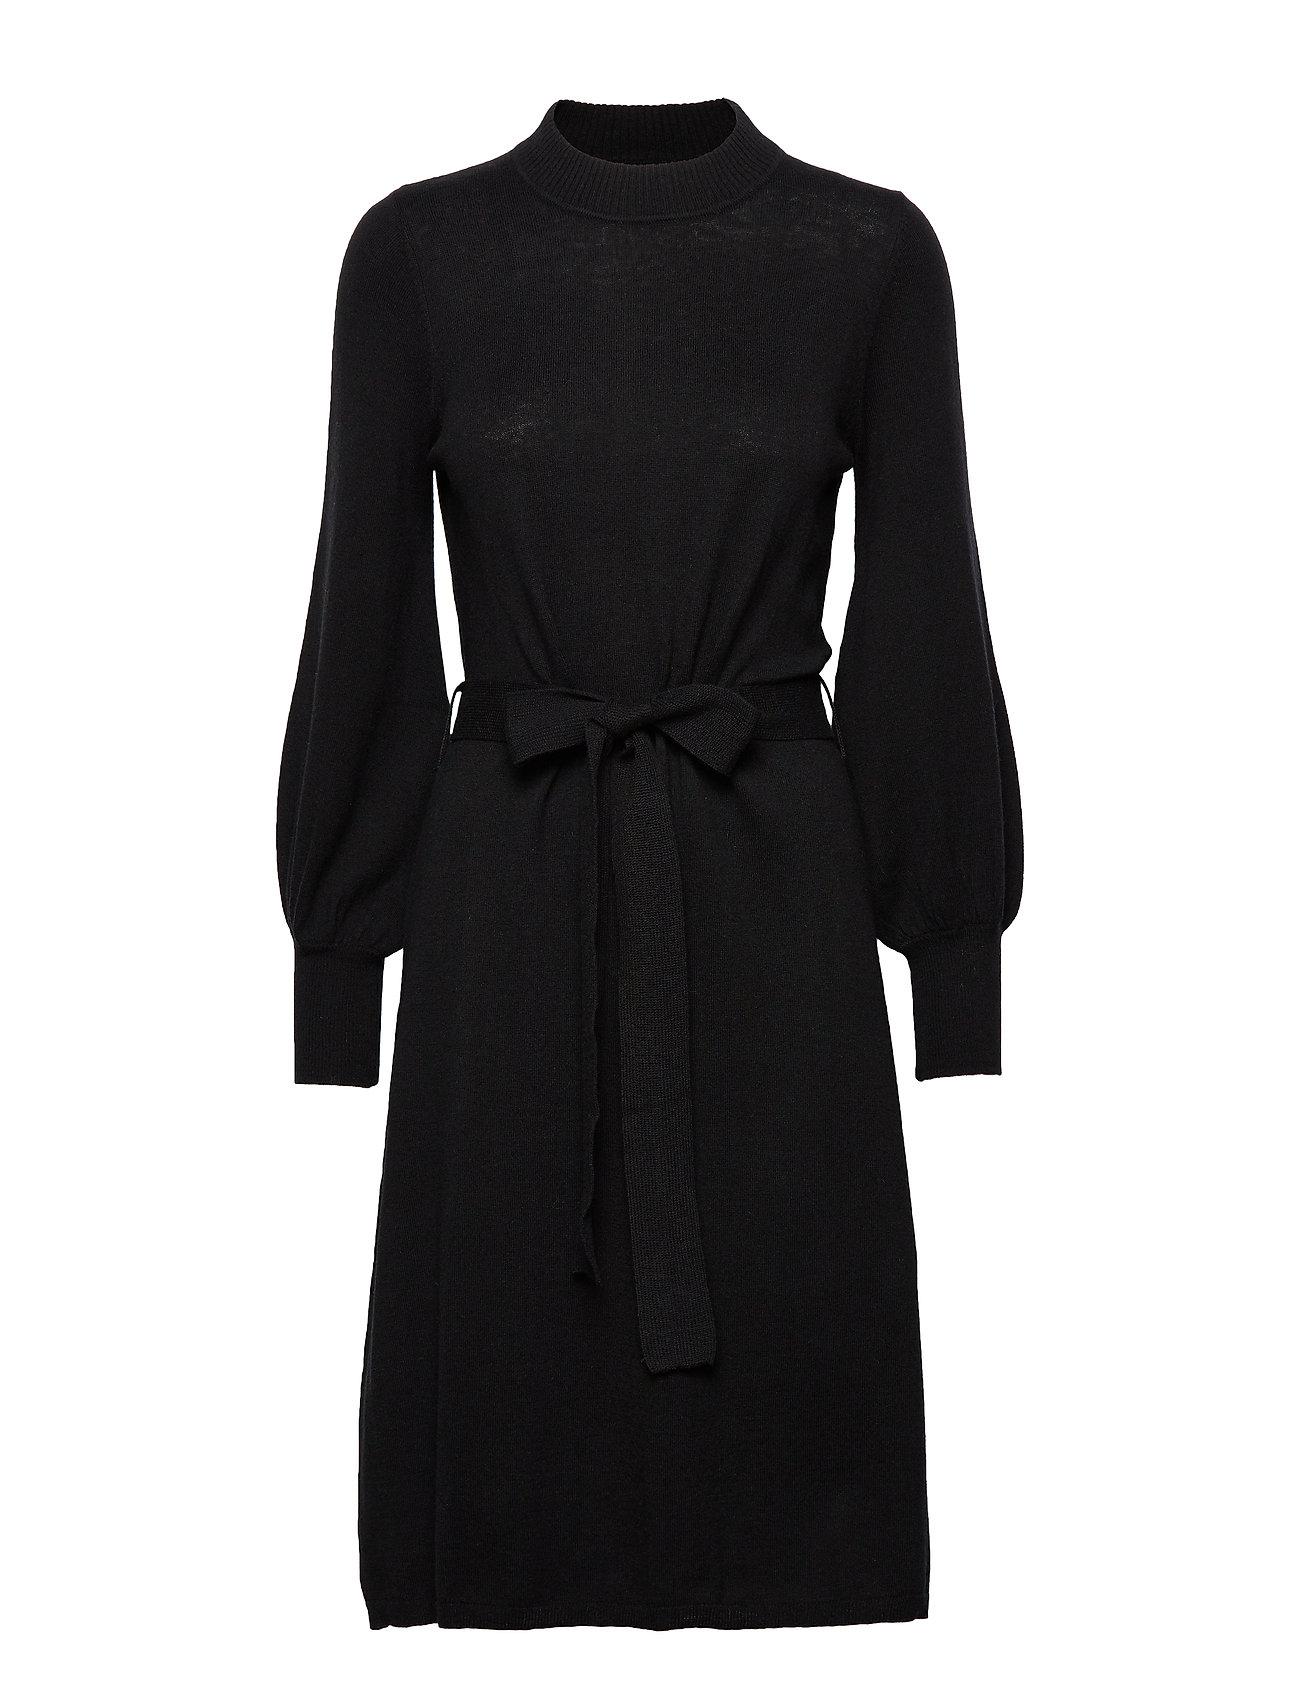 Lexington Clothing Jen Knitted Dress - BLACK